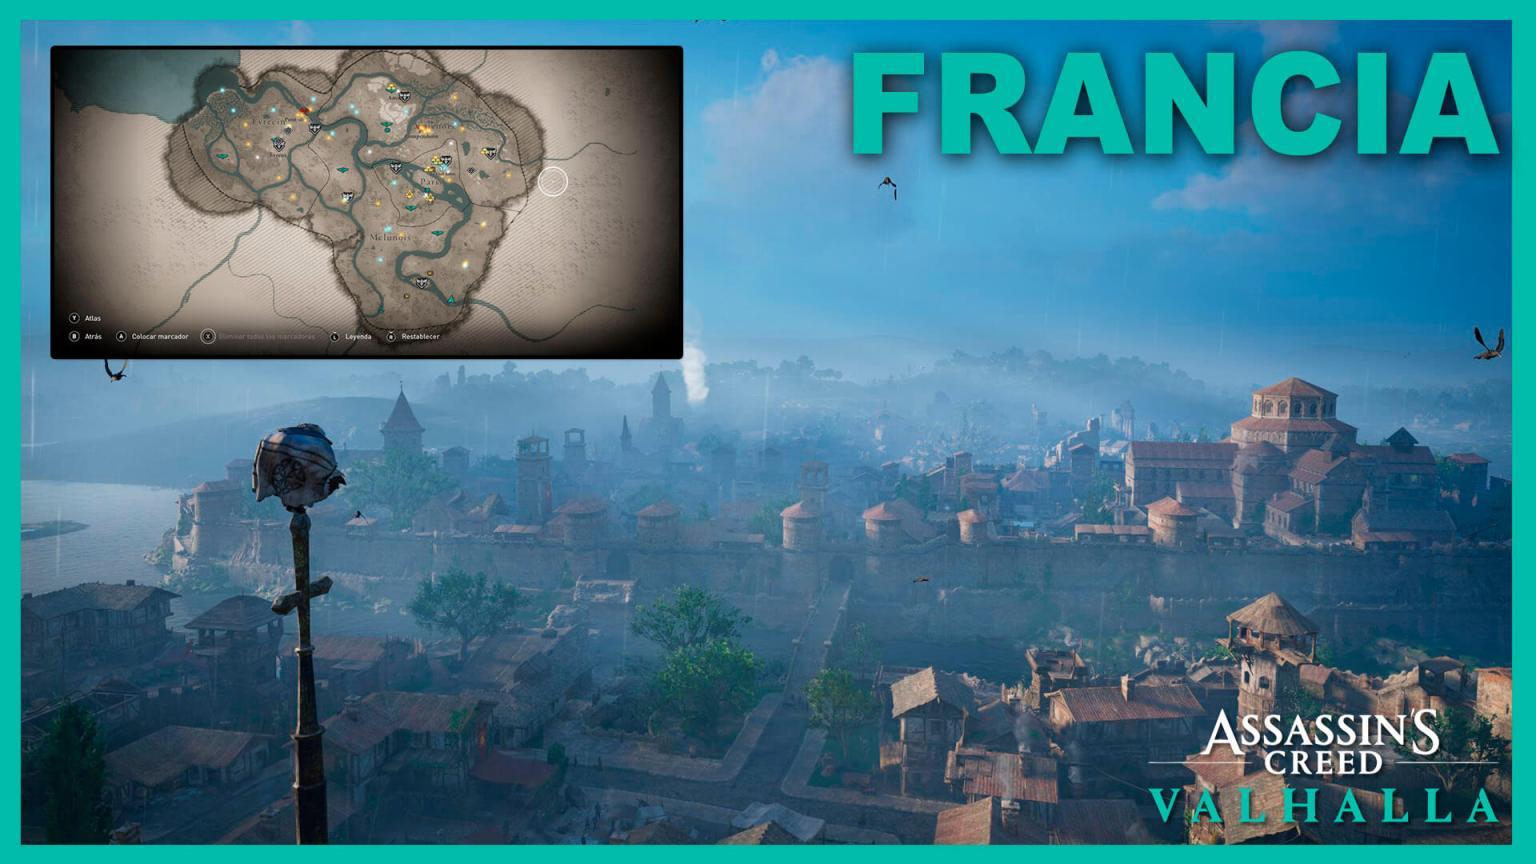 Assassin's Creed Francia